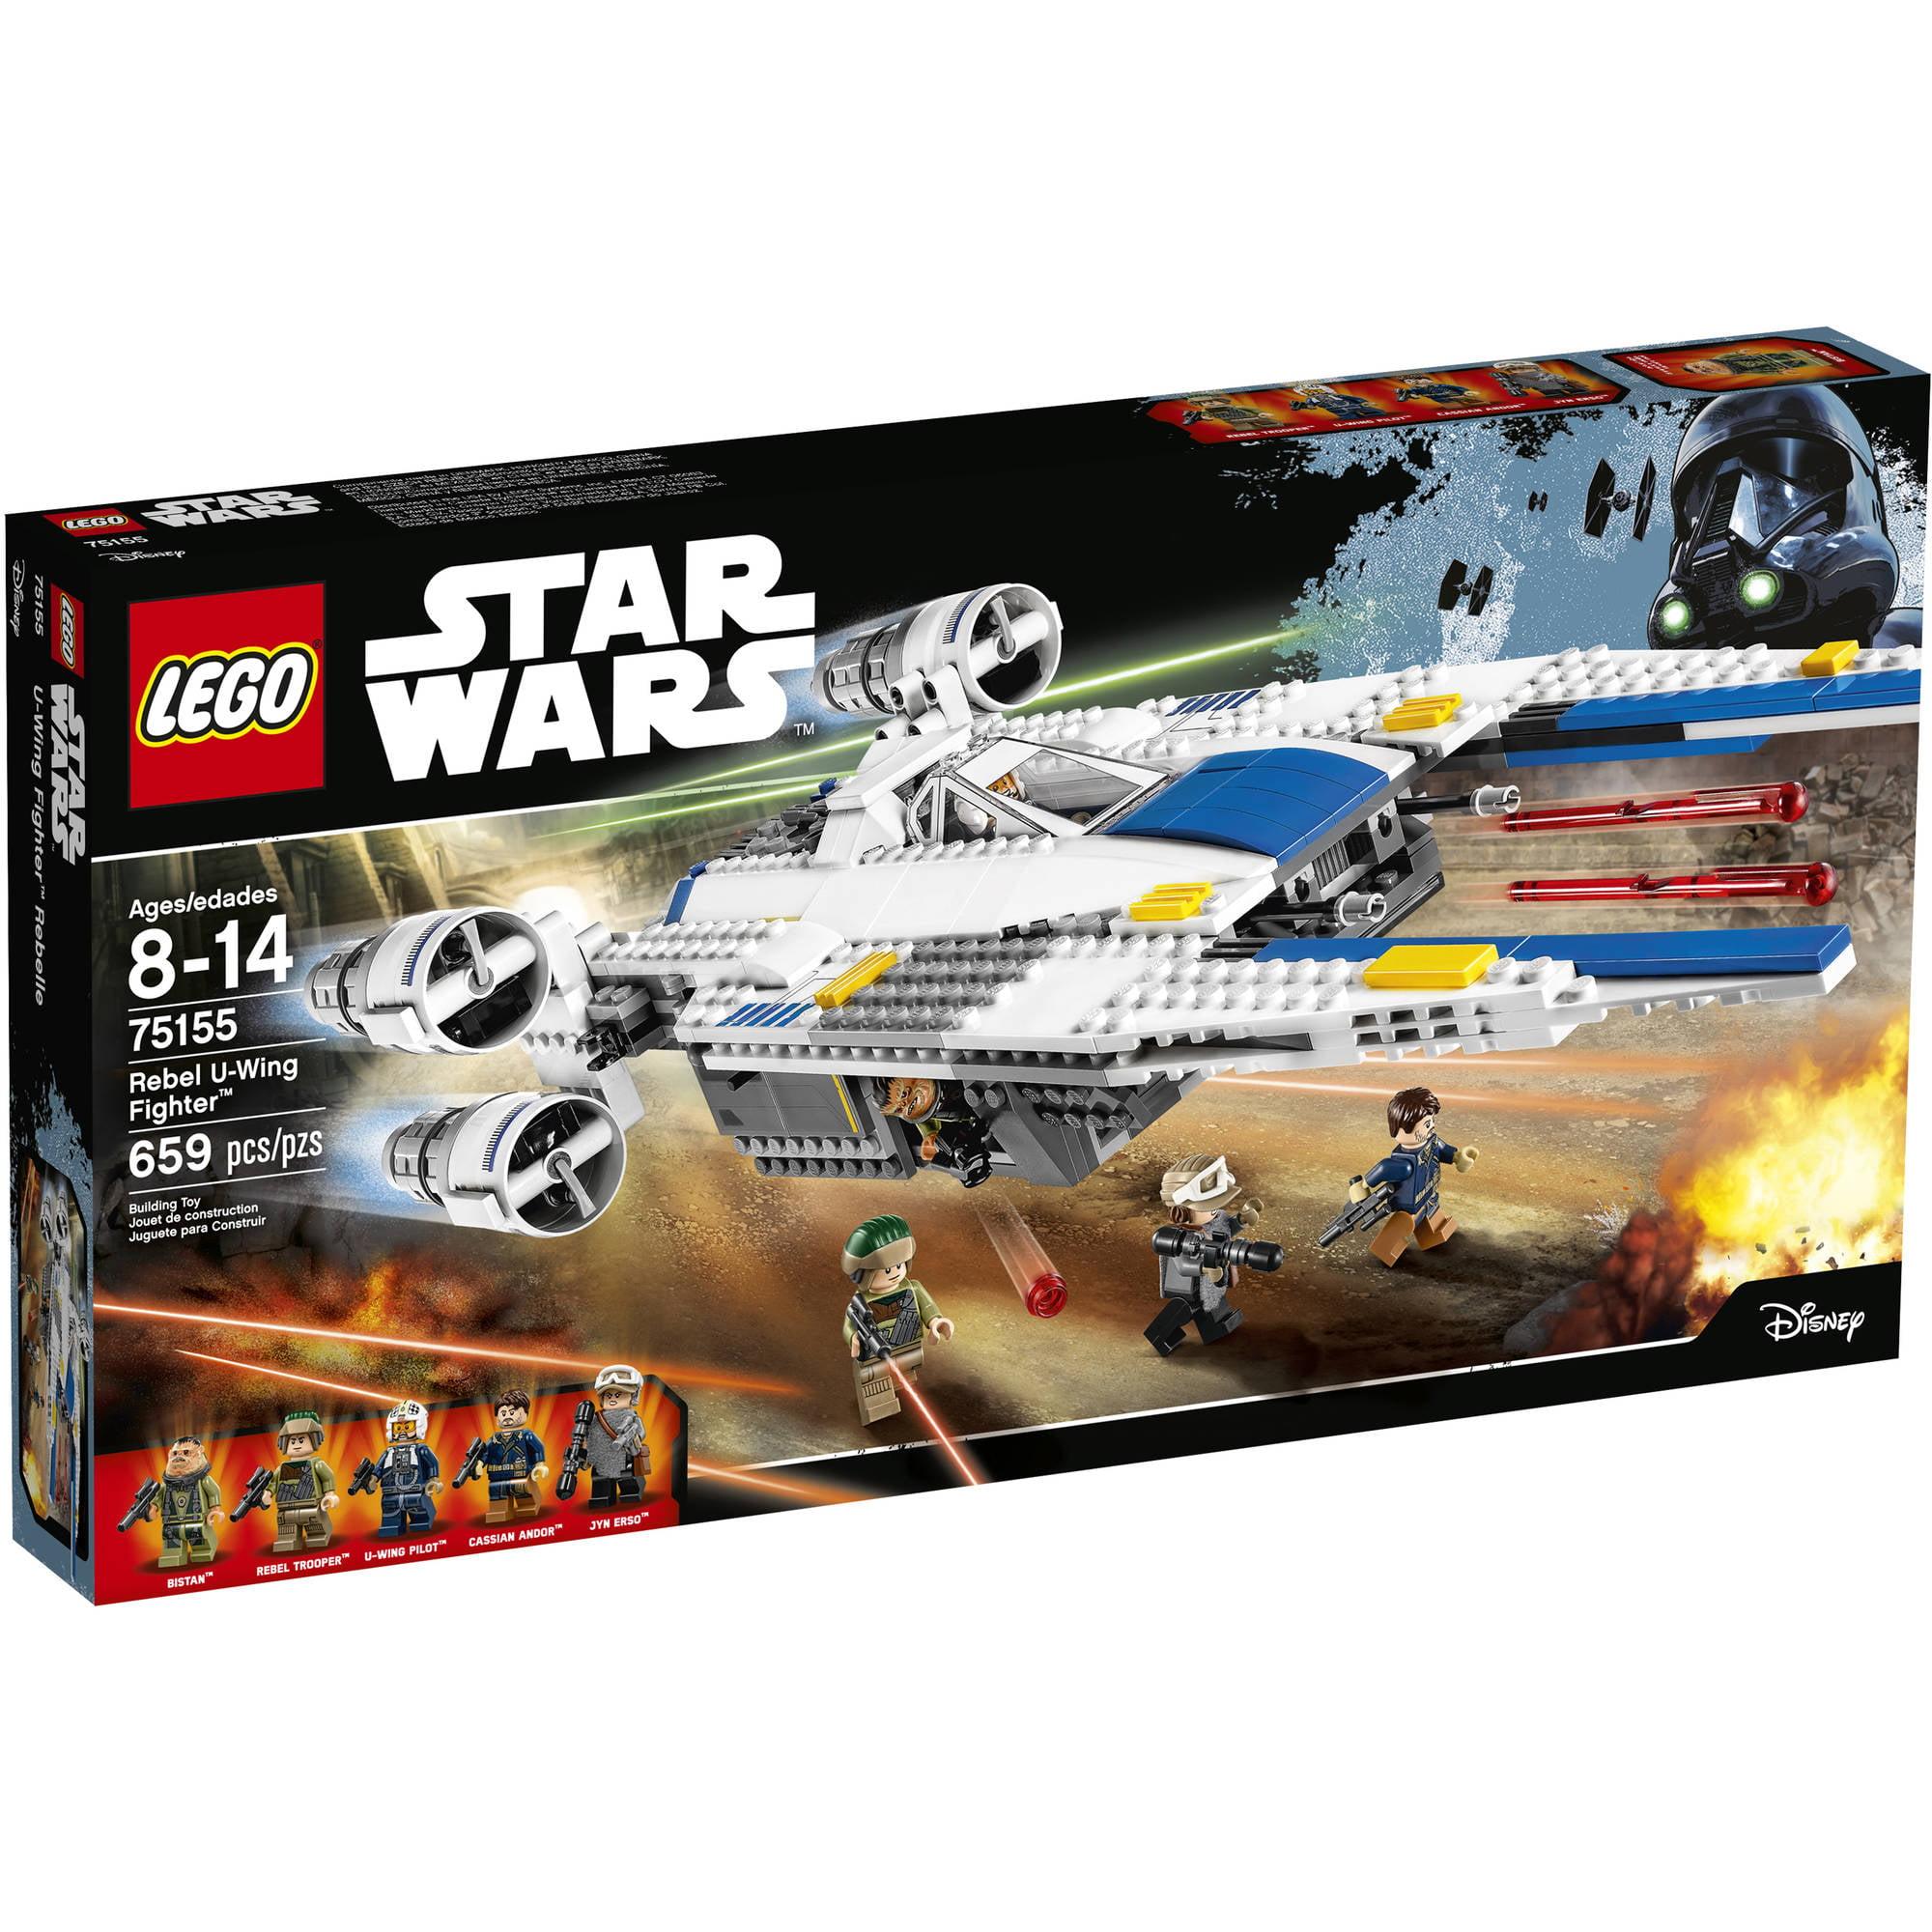 Lego Star Wars TM Rebel U-Wing Fighter 75155 by LEGO Systems, Inc.